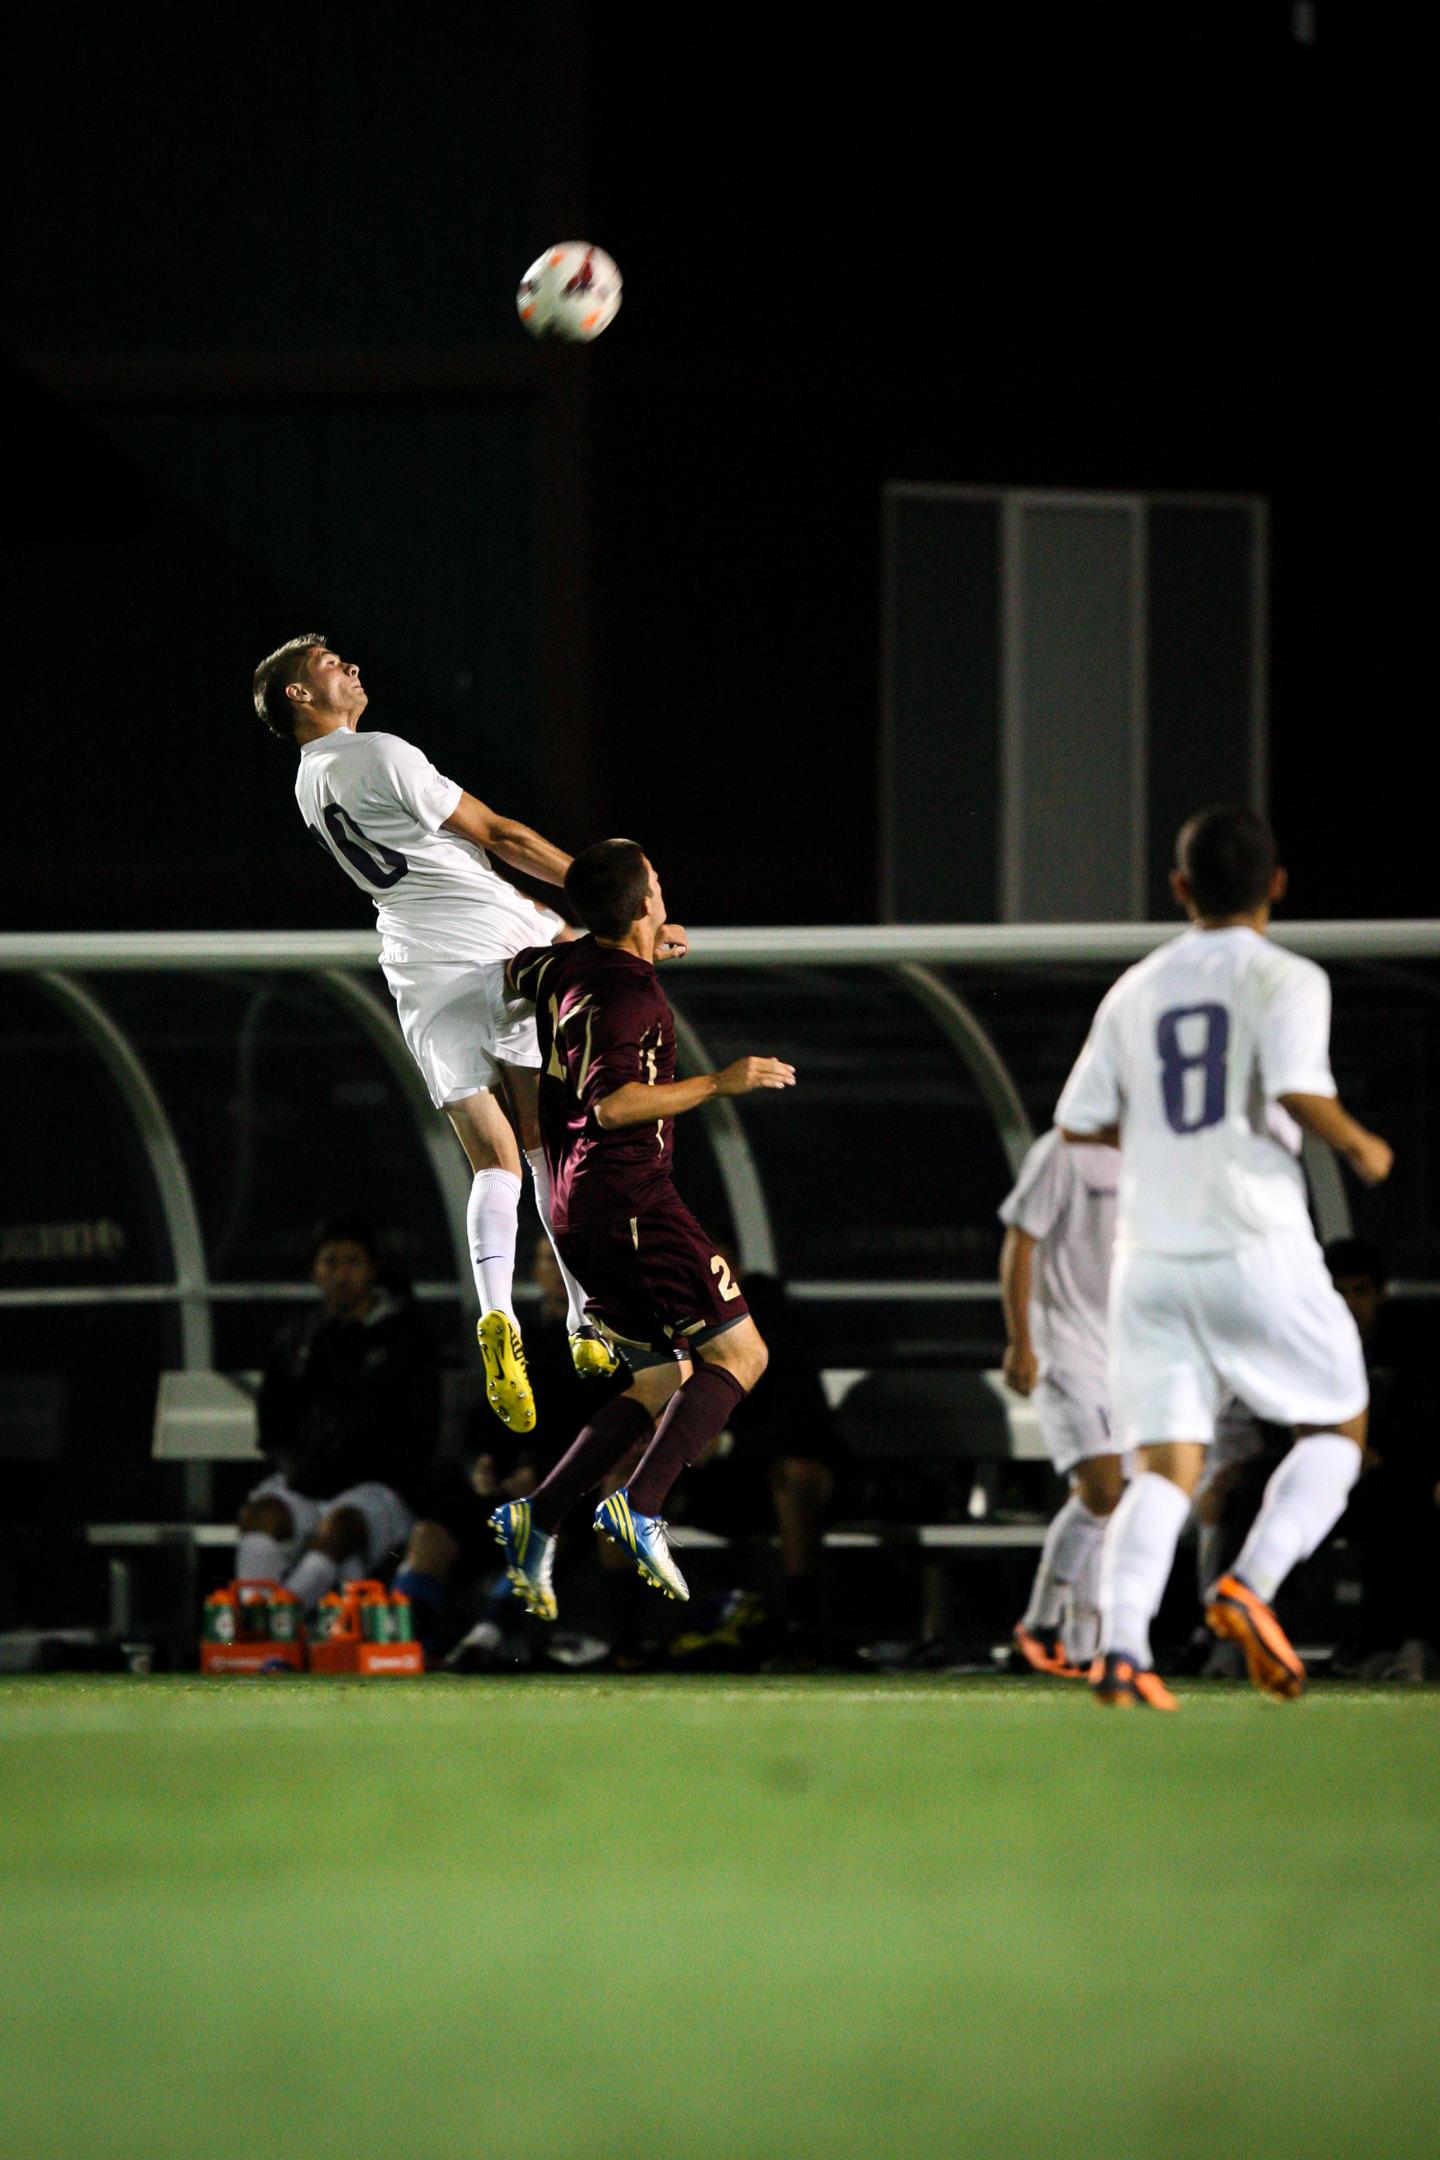 University of Washington Huskies Men's Soccer Forward Kyle Coffee Header against Seattle Pacific University